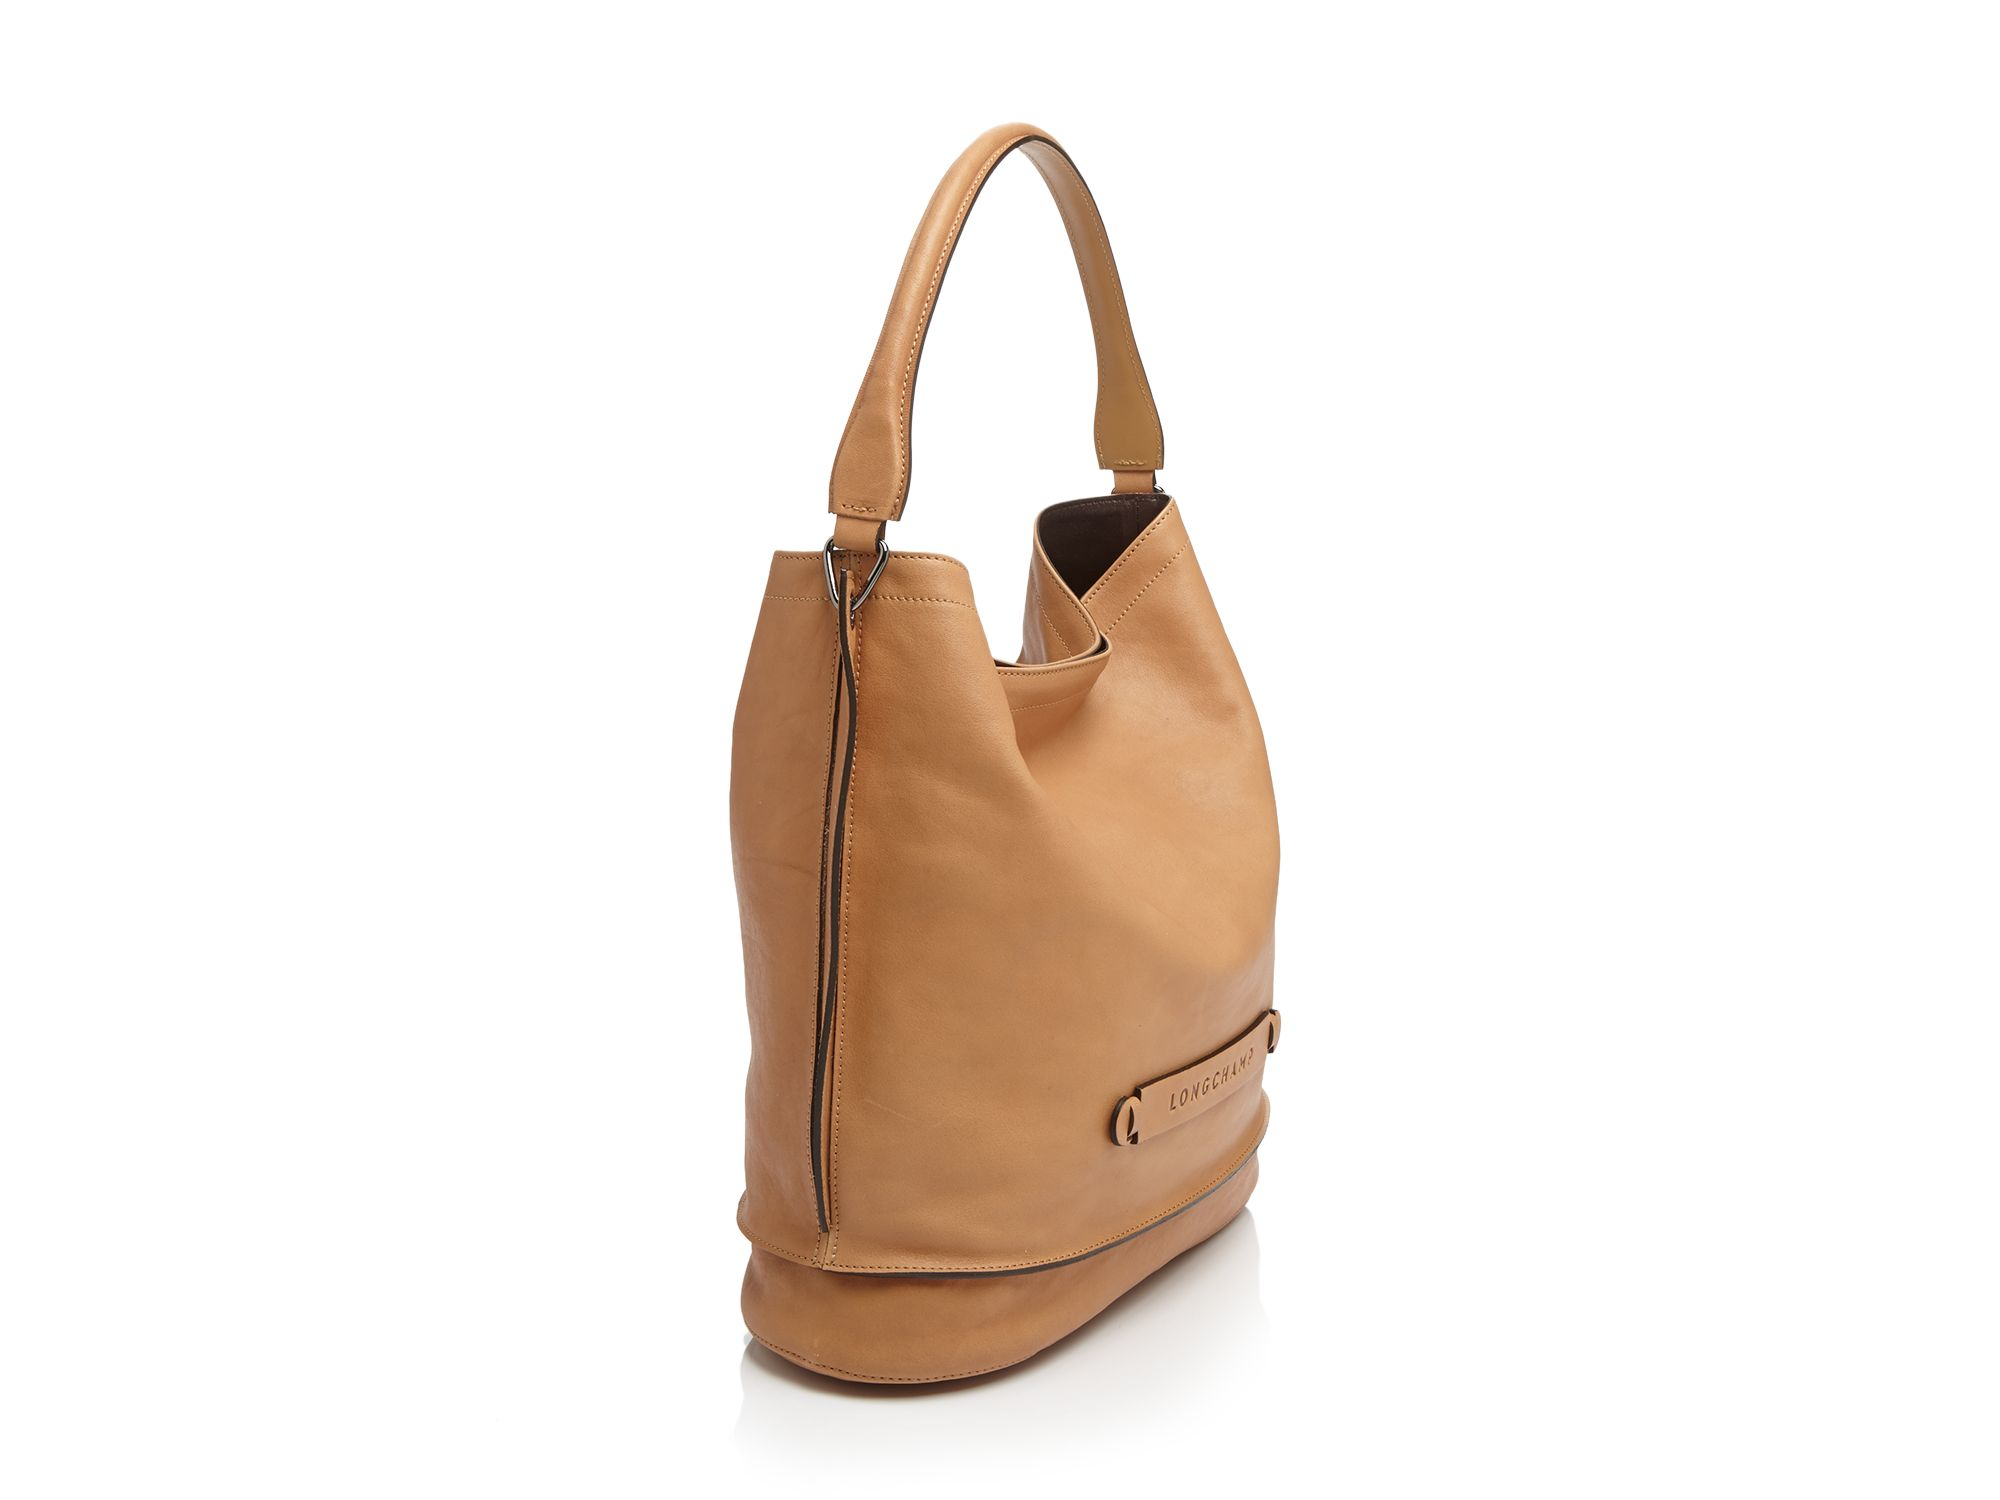 Longchamp Leather 3d Hobo In Khaki Natural Lyst